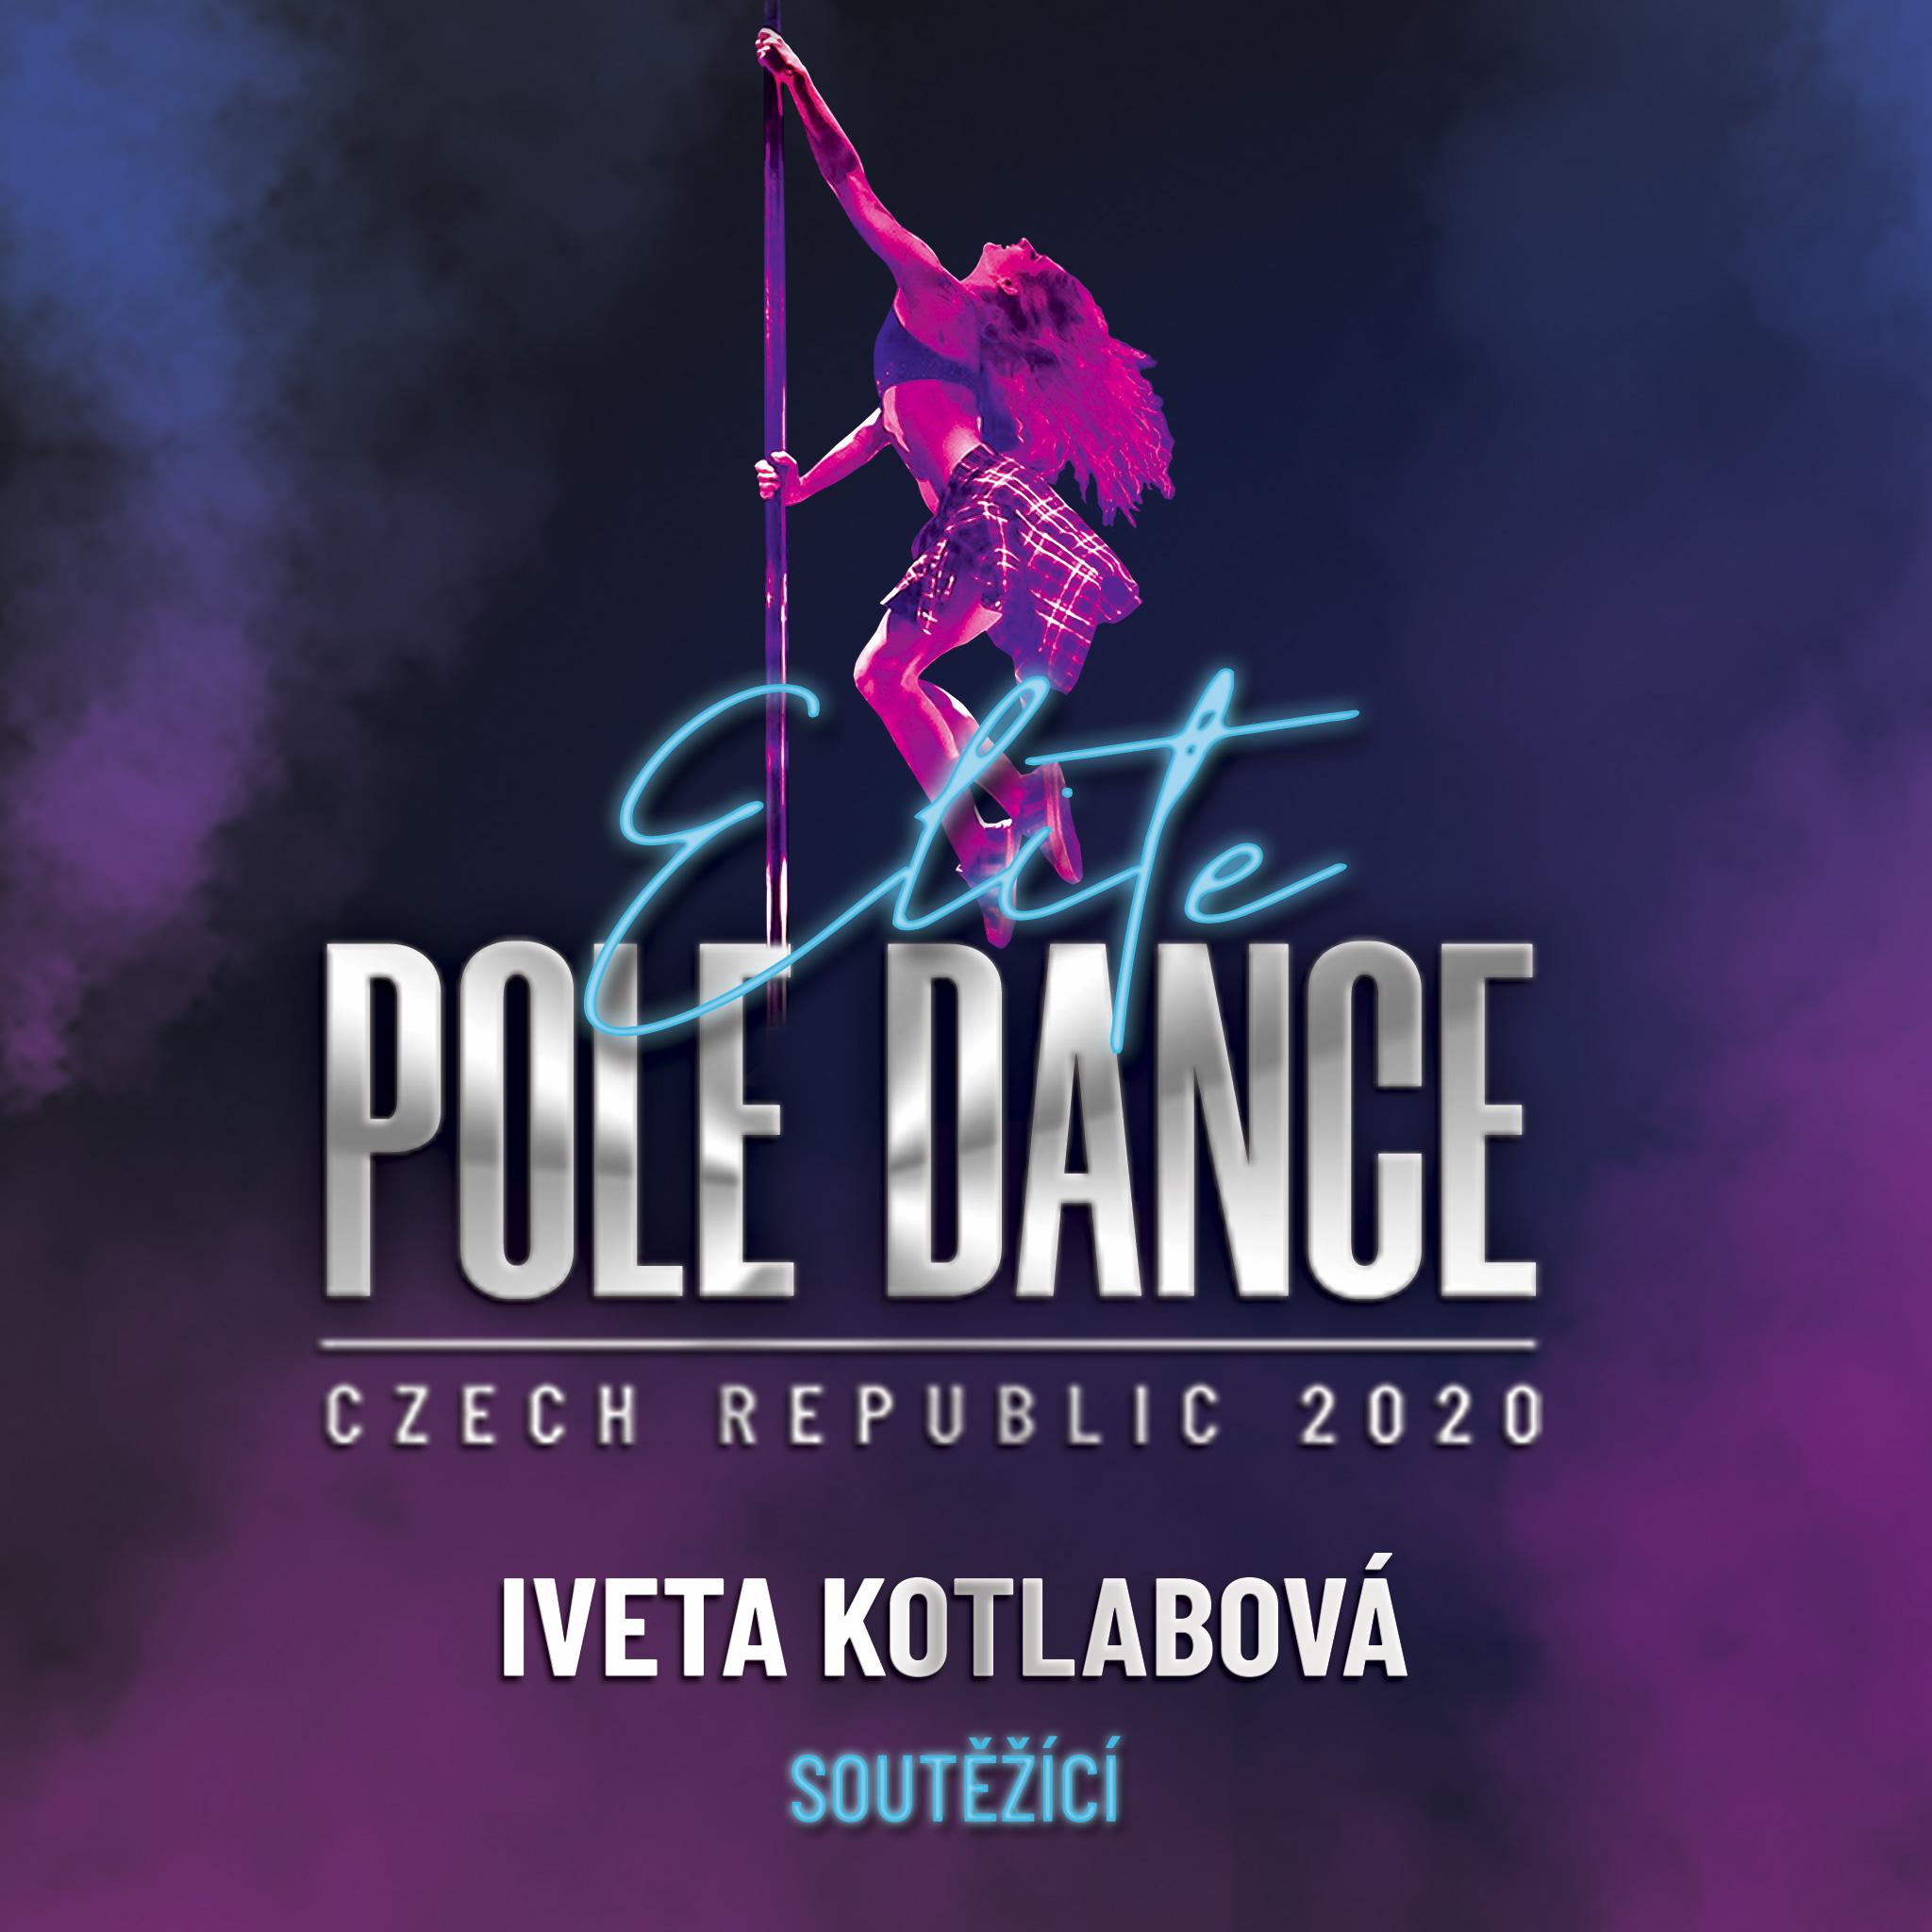 Iveta Kotlabová Elite Pole Dance ČR